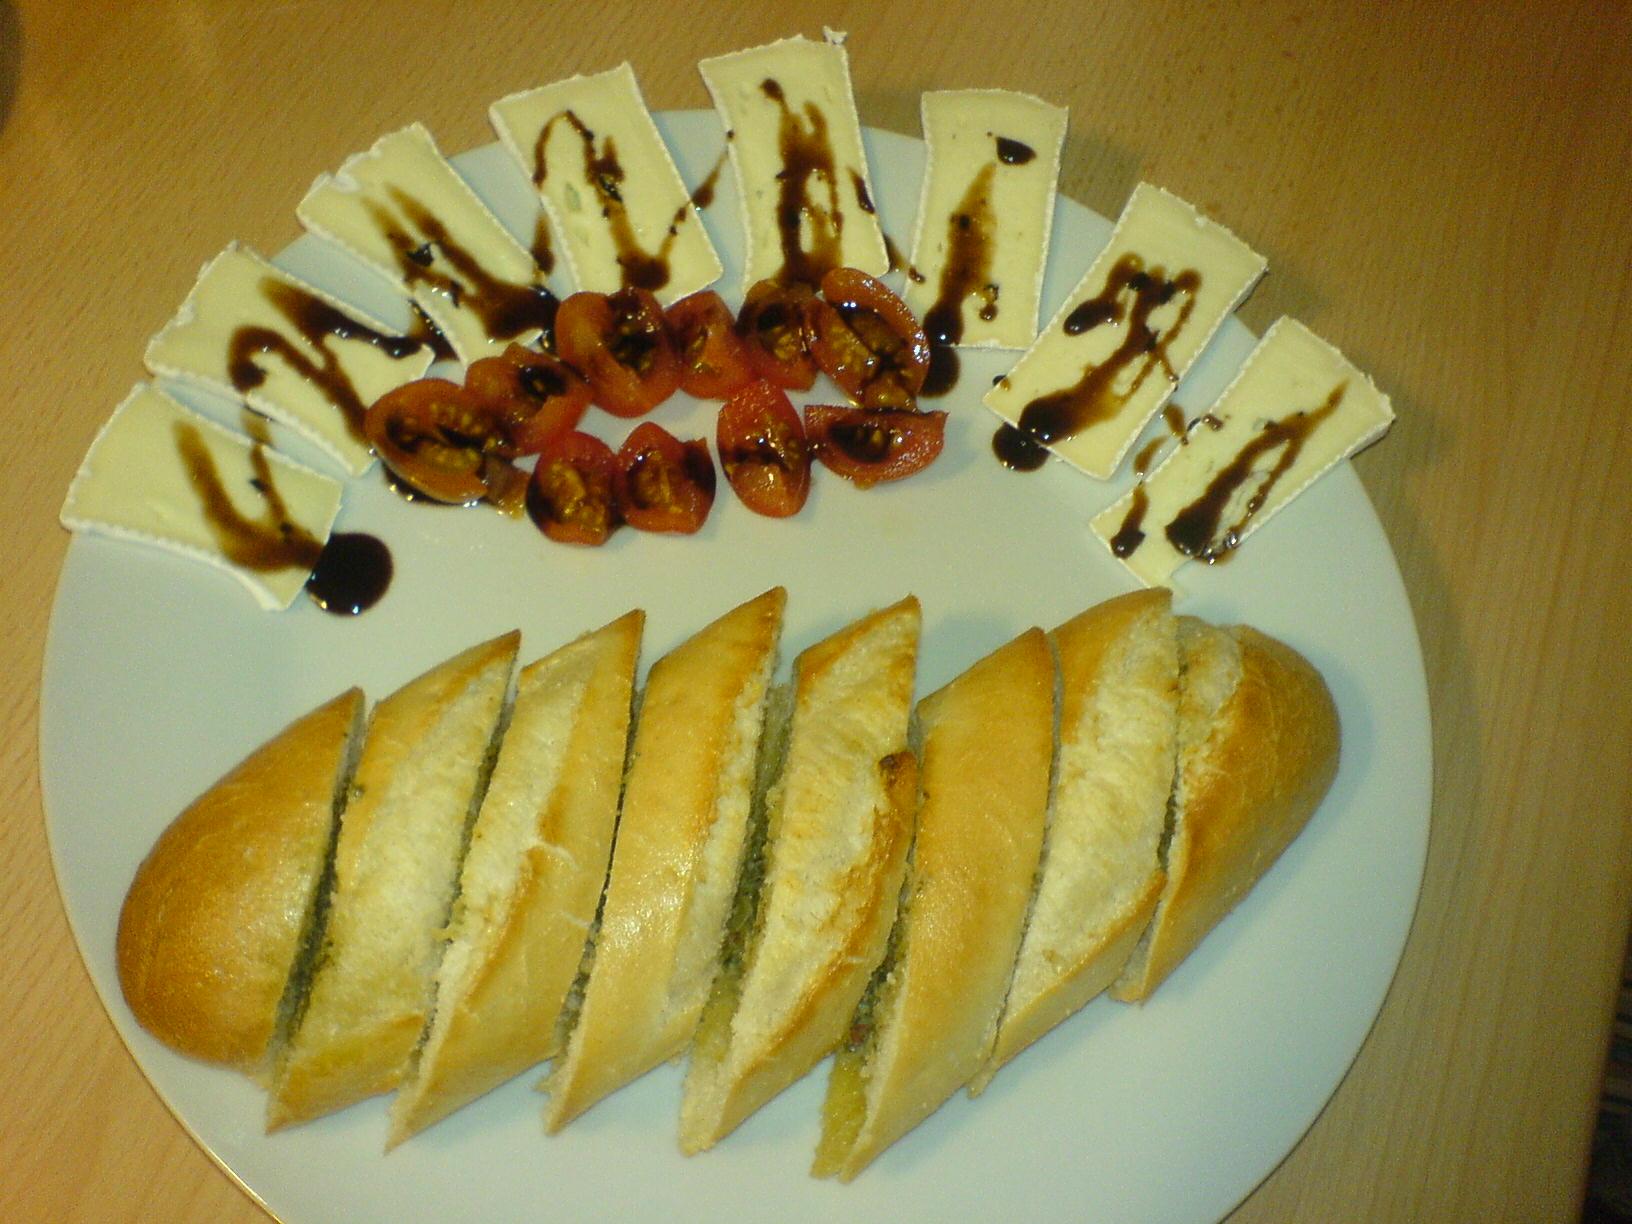 http://foodloader.net/Holz_2010-02-08_Kraeuterbaguette_mit_Camembert_und_Tomaten.jpg